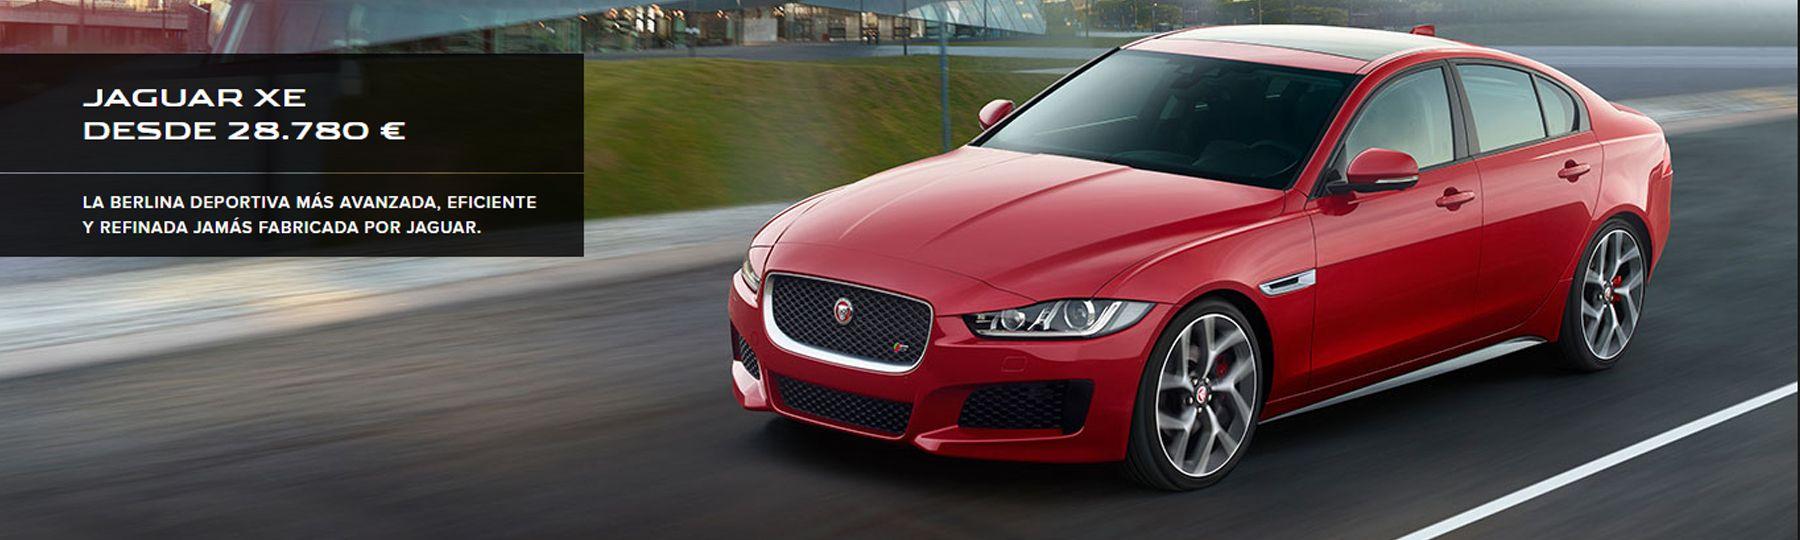 Jaguar XE desde 28.780€